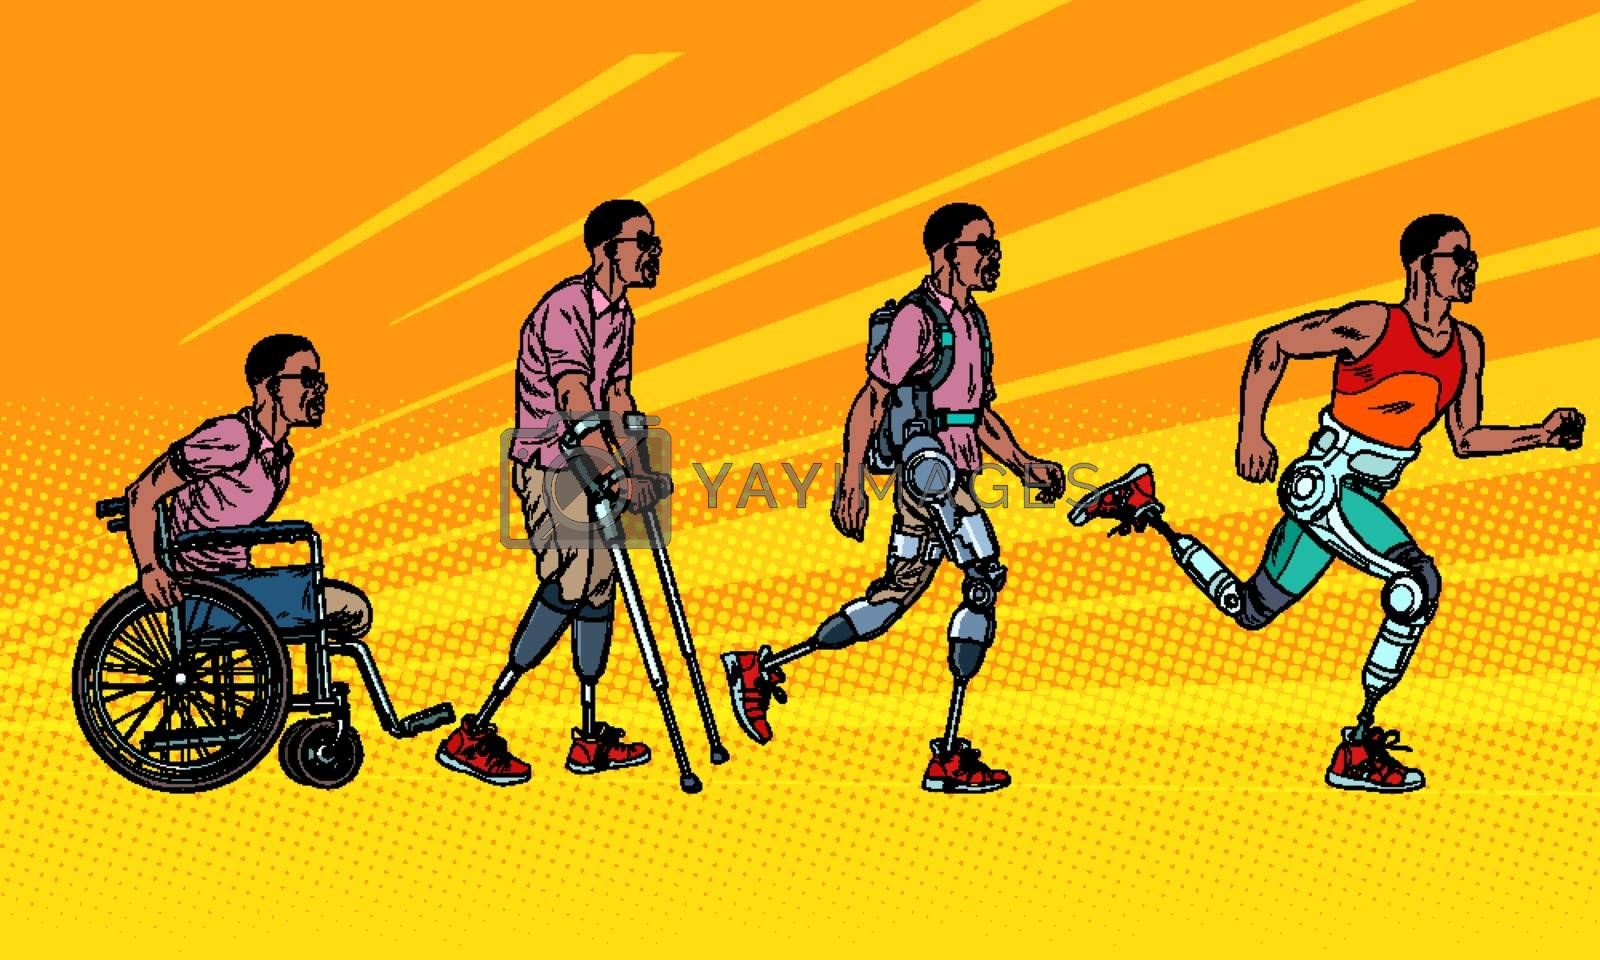 Evolution of rehabilitation. african man leg prosthesis. Pop art retro vector illustration vintage kitsch 60s 50s